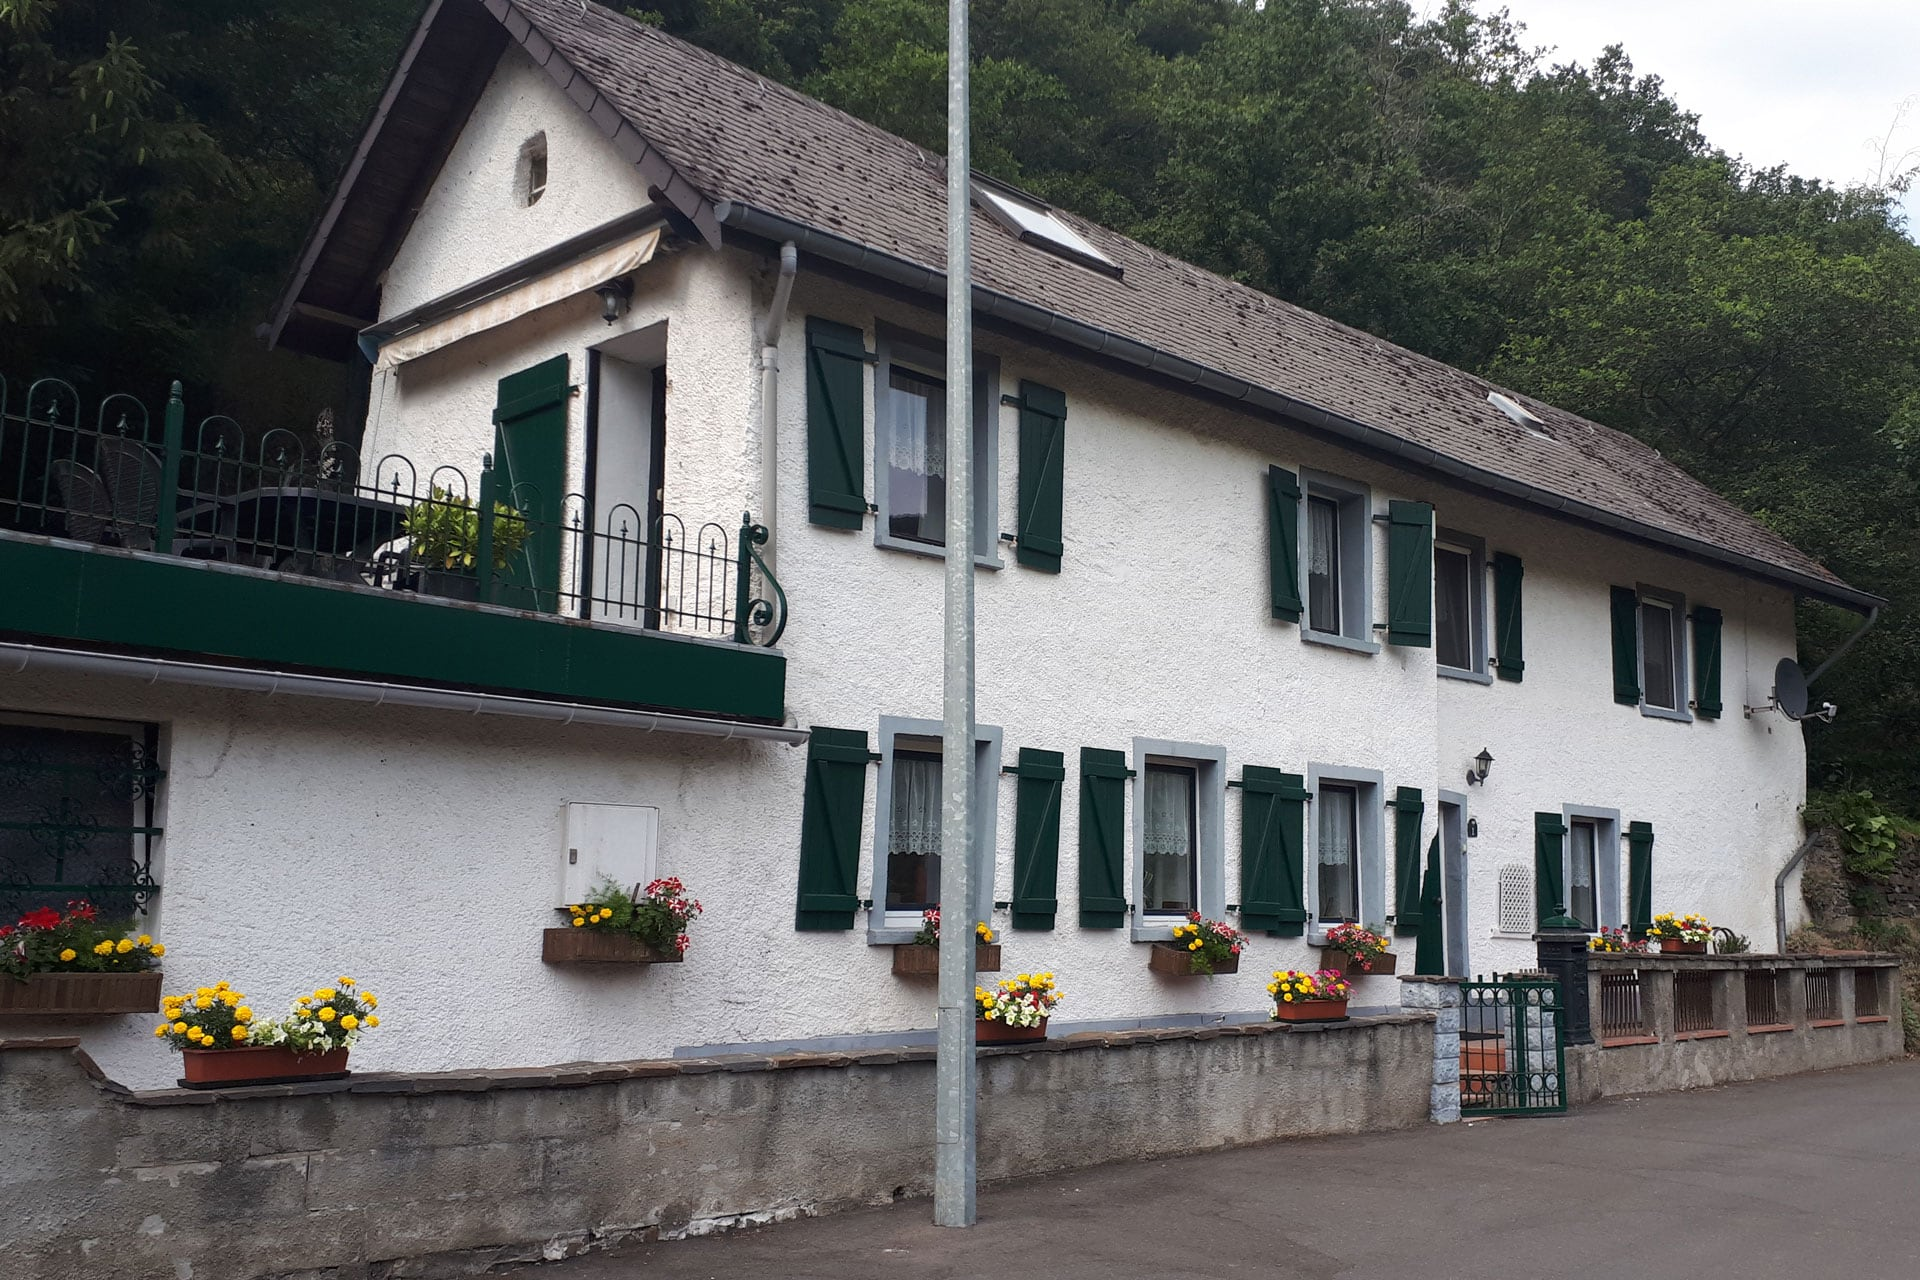 Vakantiehuis - Camping Kautenbach